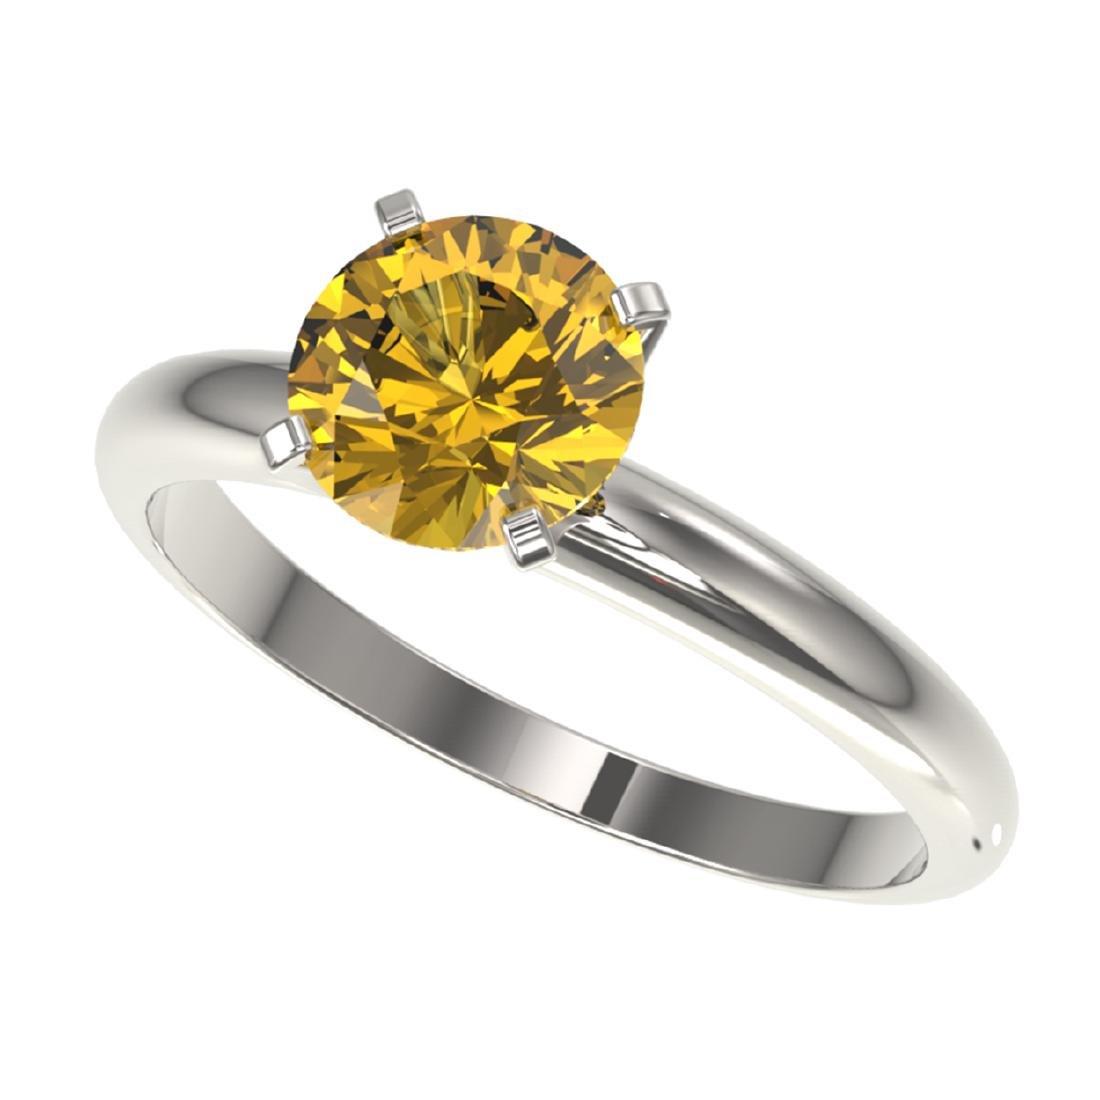 1.50 ctw Intense Yellow Diamond Solitaire Ring 10K